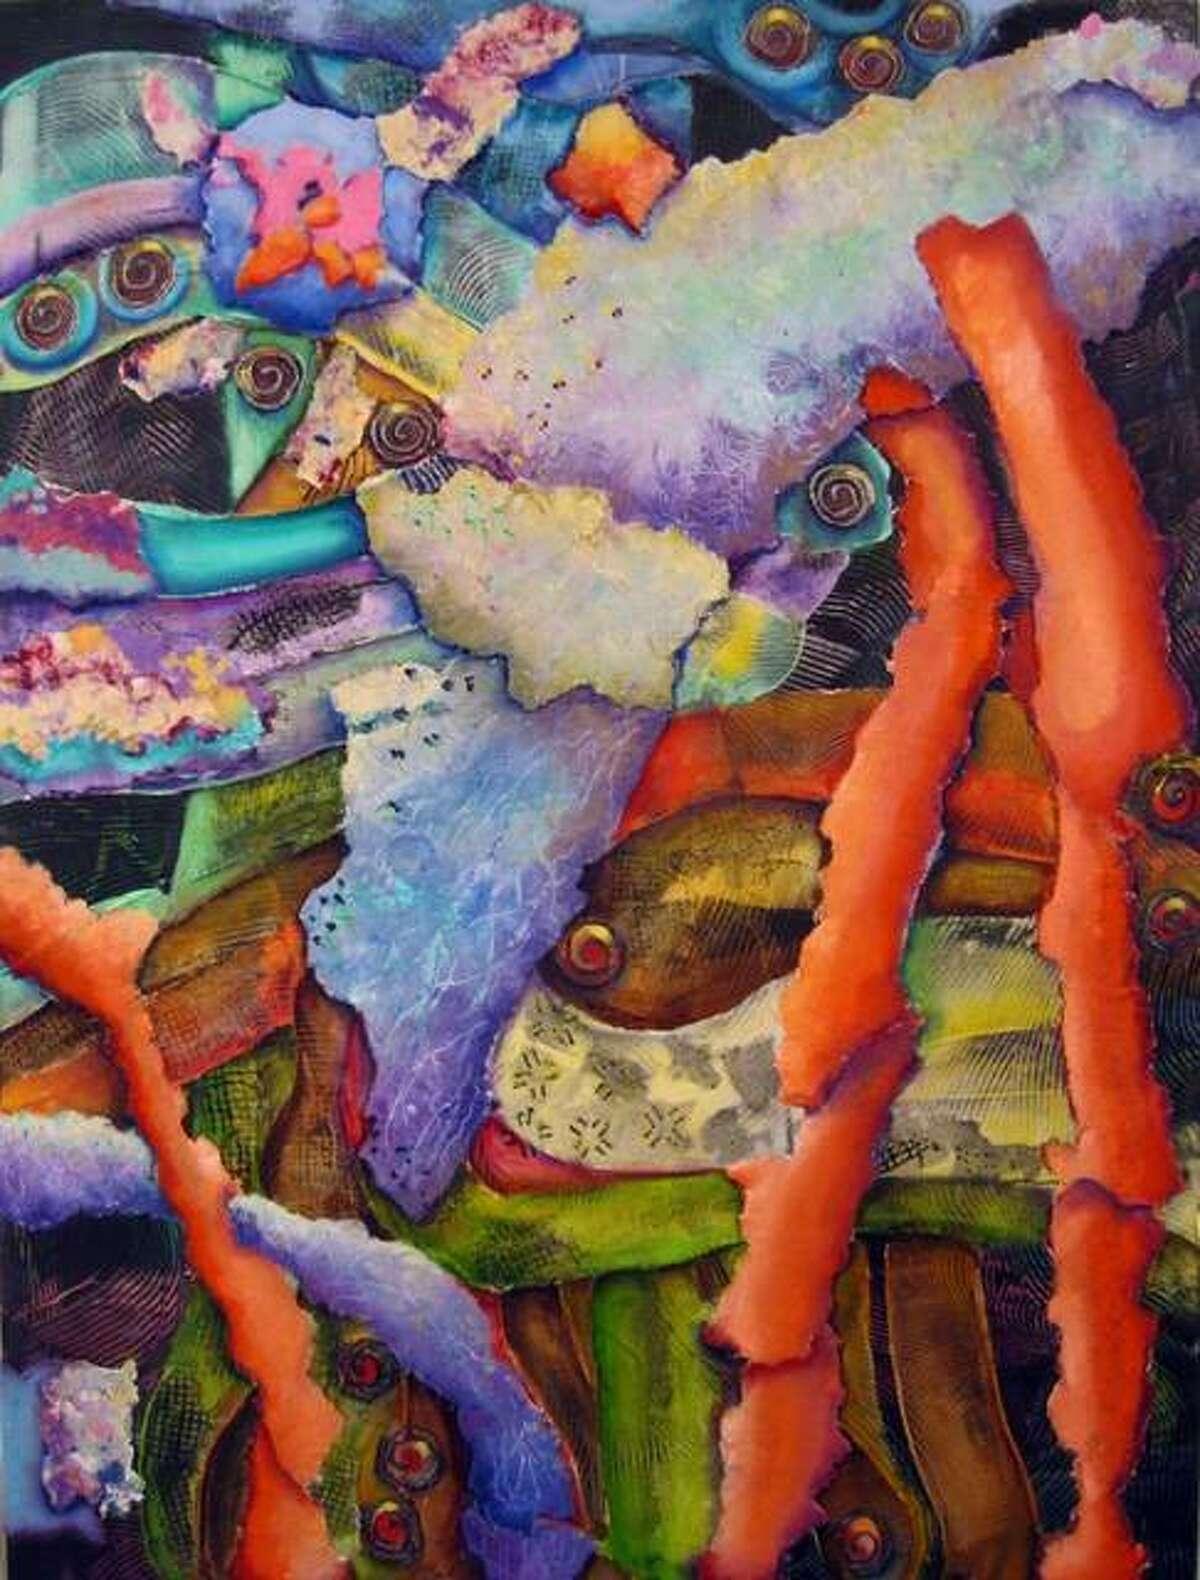 Surfaces SVIIII by Dion Dion, 48